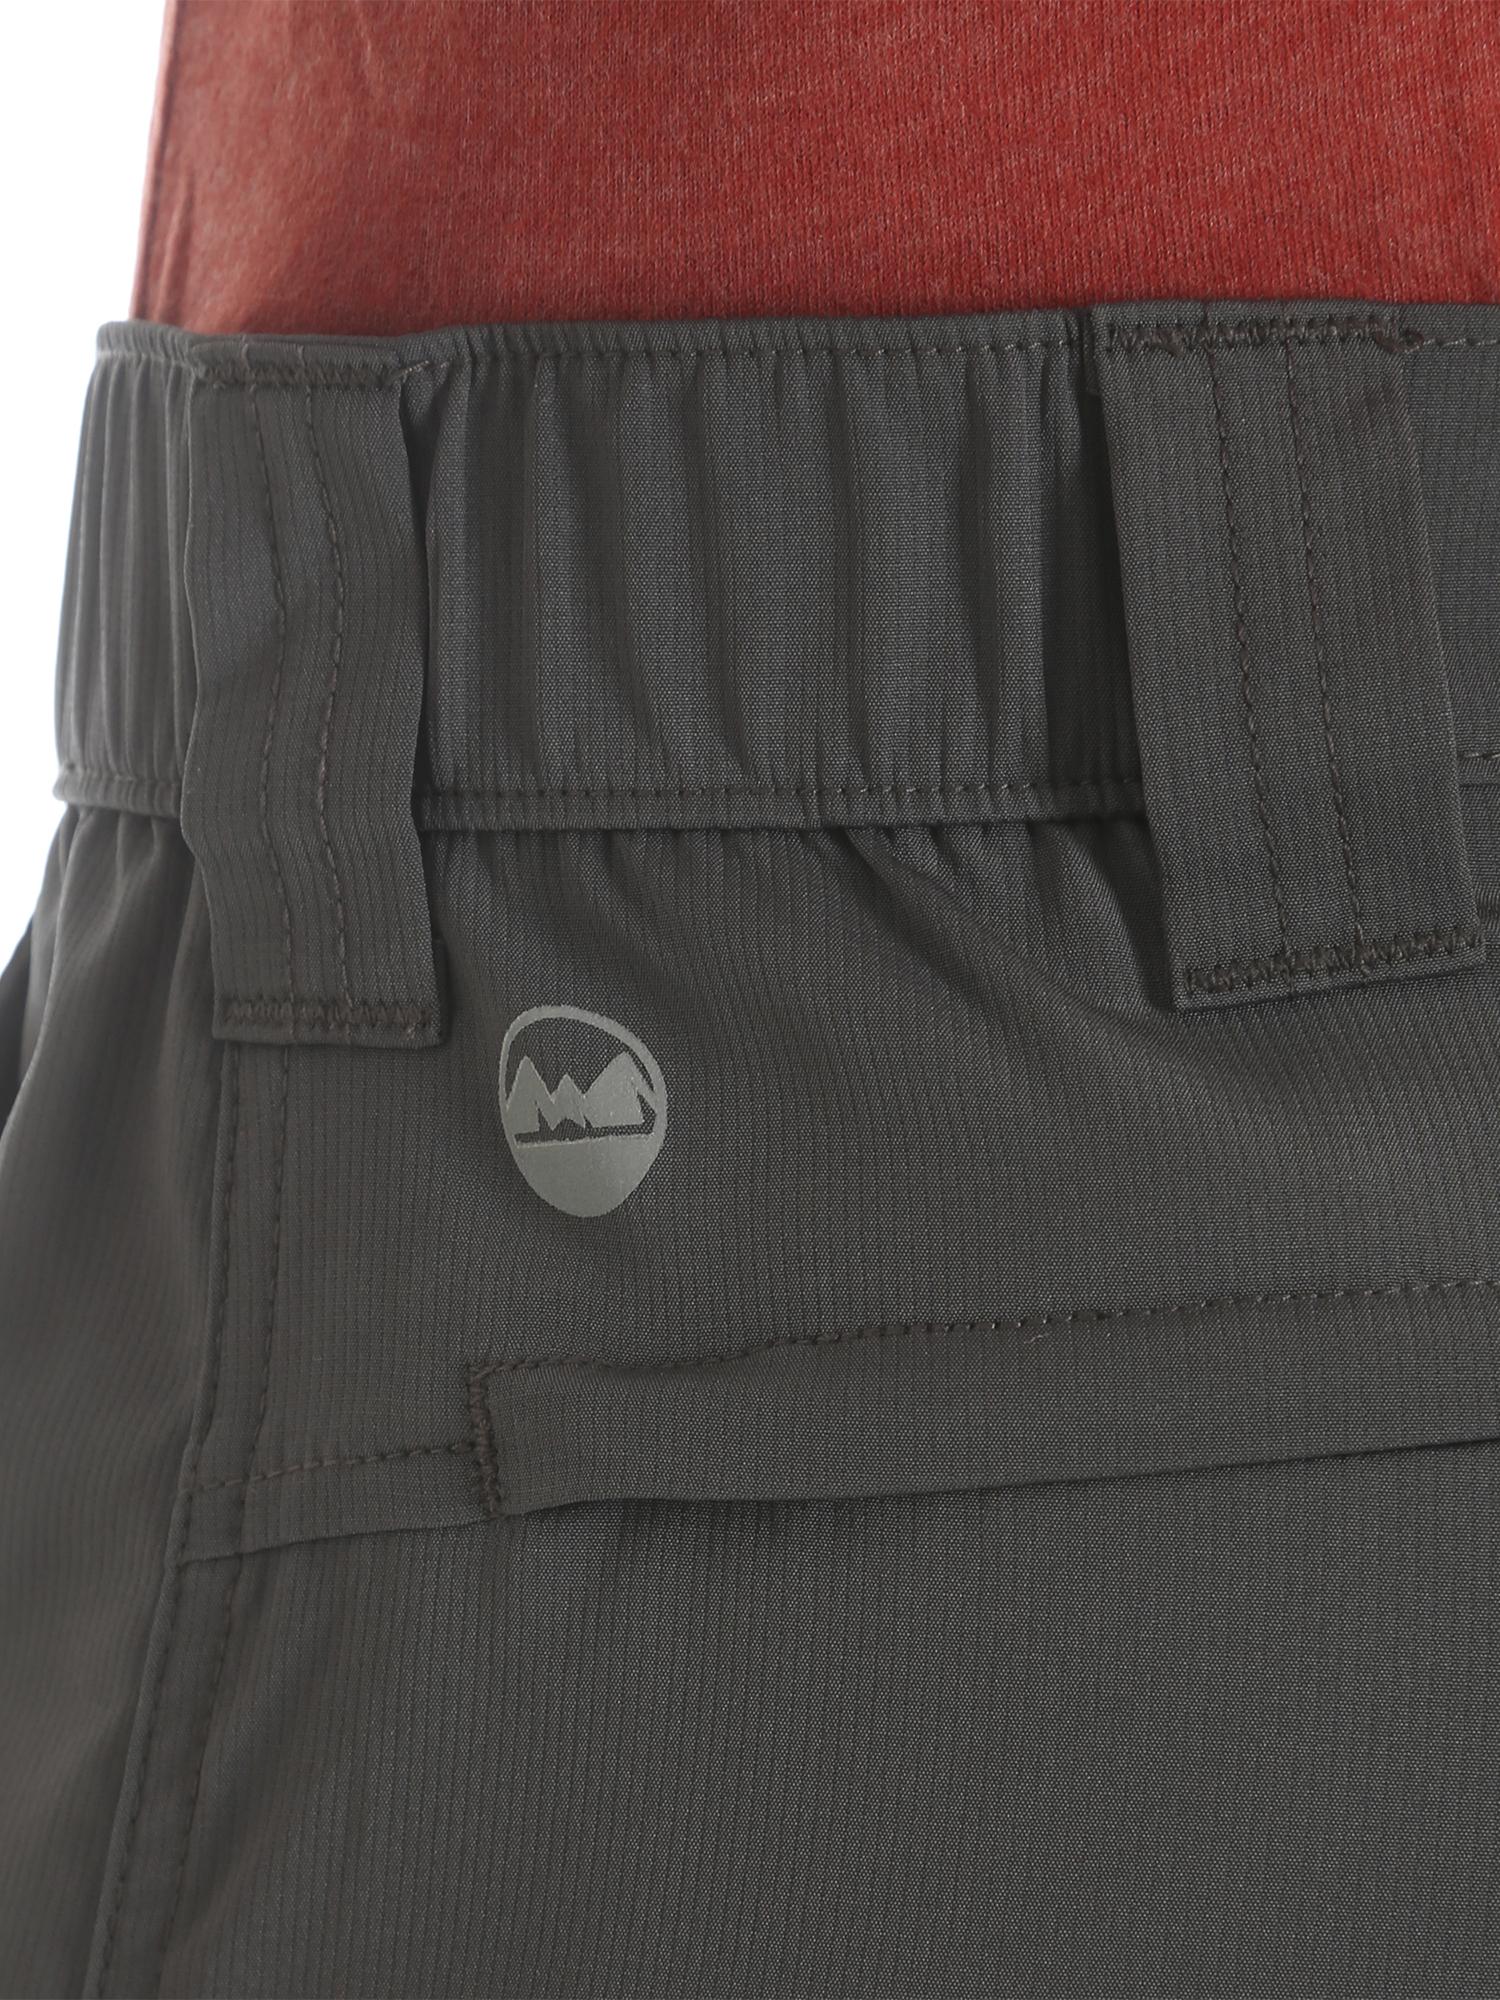 Wrangler NEW Solid Men/'s Outdoor Performance Flex Side Elastic Utility Shorts